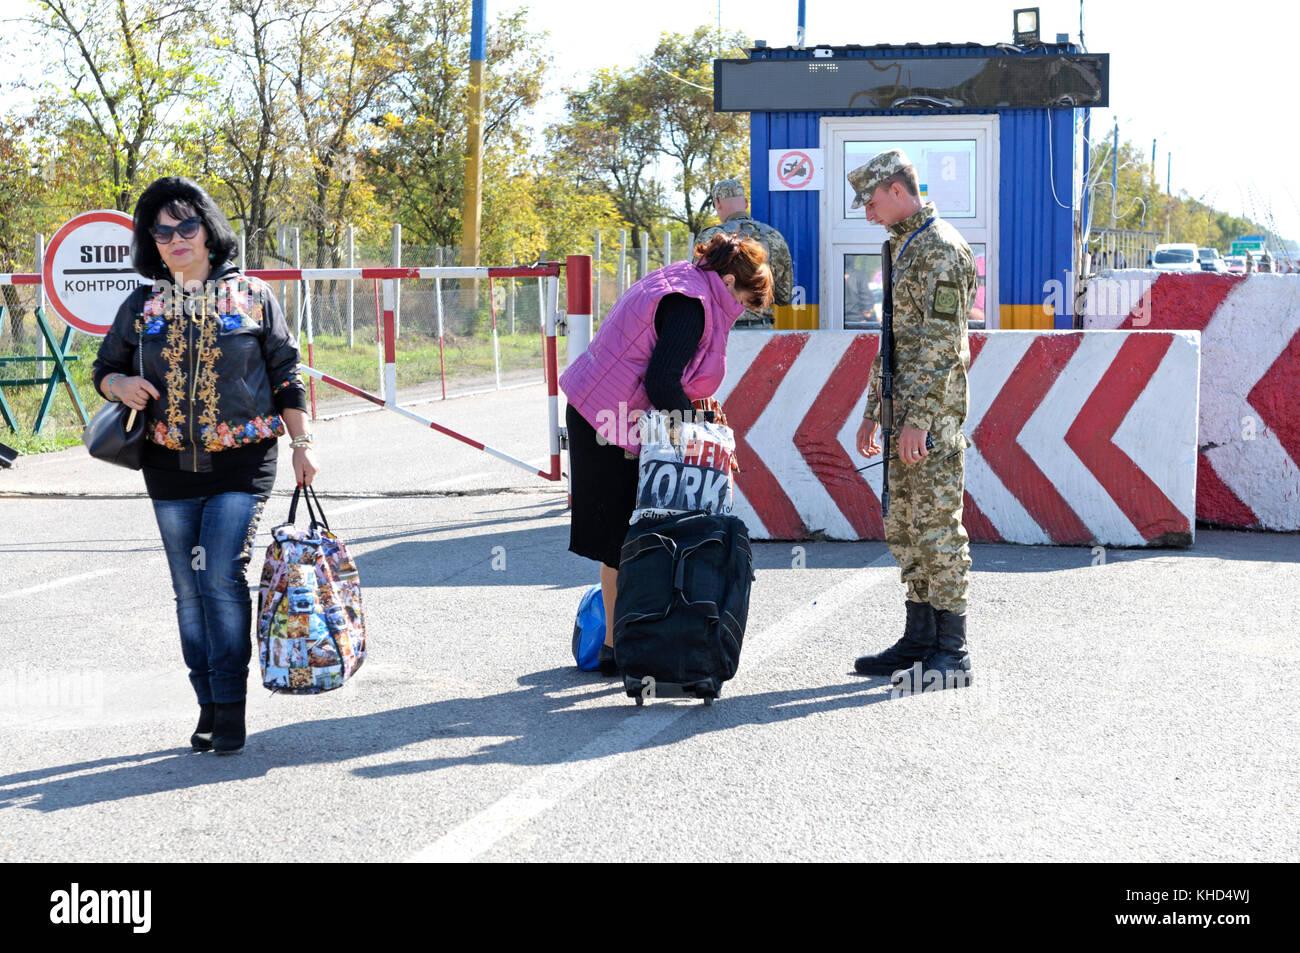 Border guard checking bags of travelers at the border crossing point Kalanchak, Ukrainian-Russian border. Sept 20,2017. - Stock Image